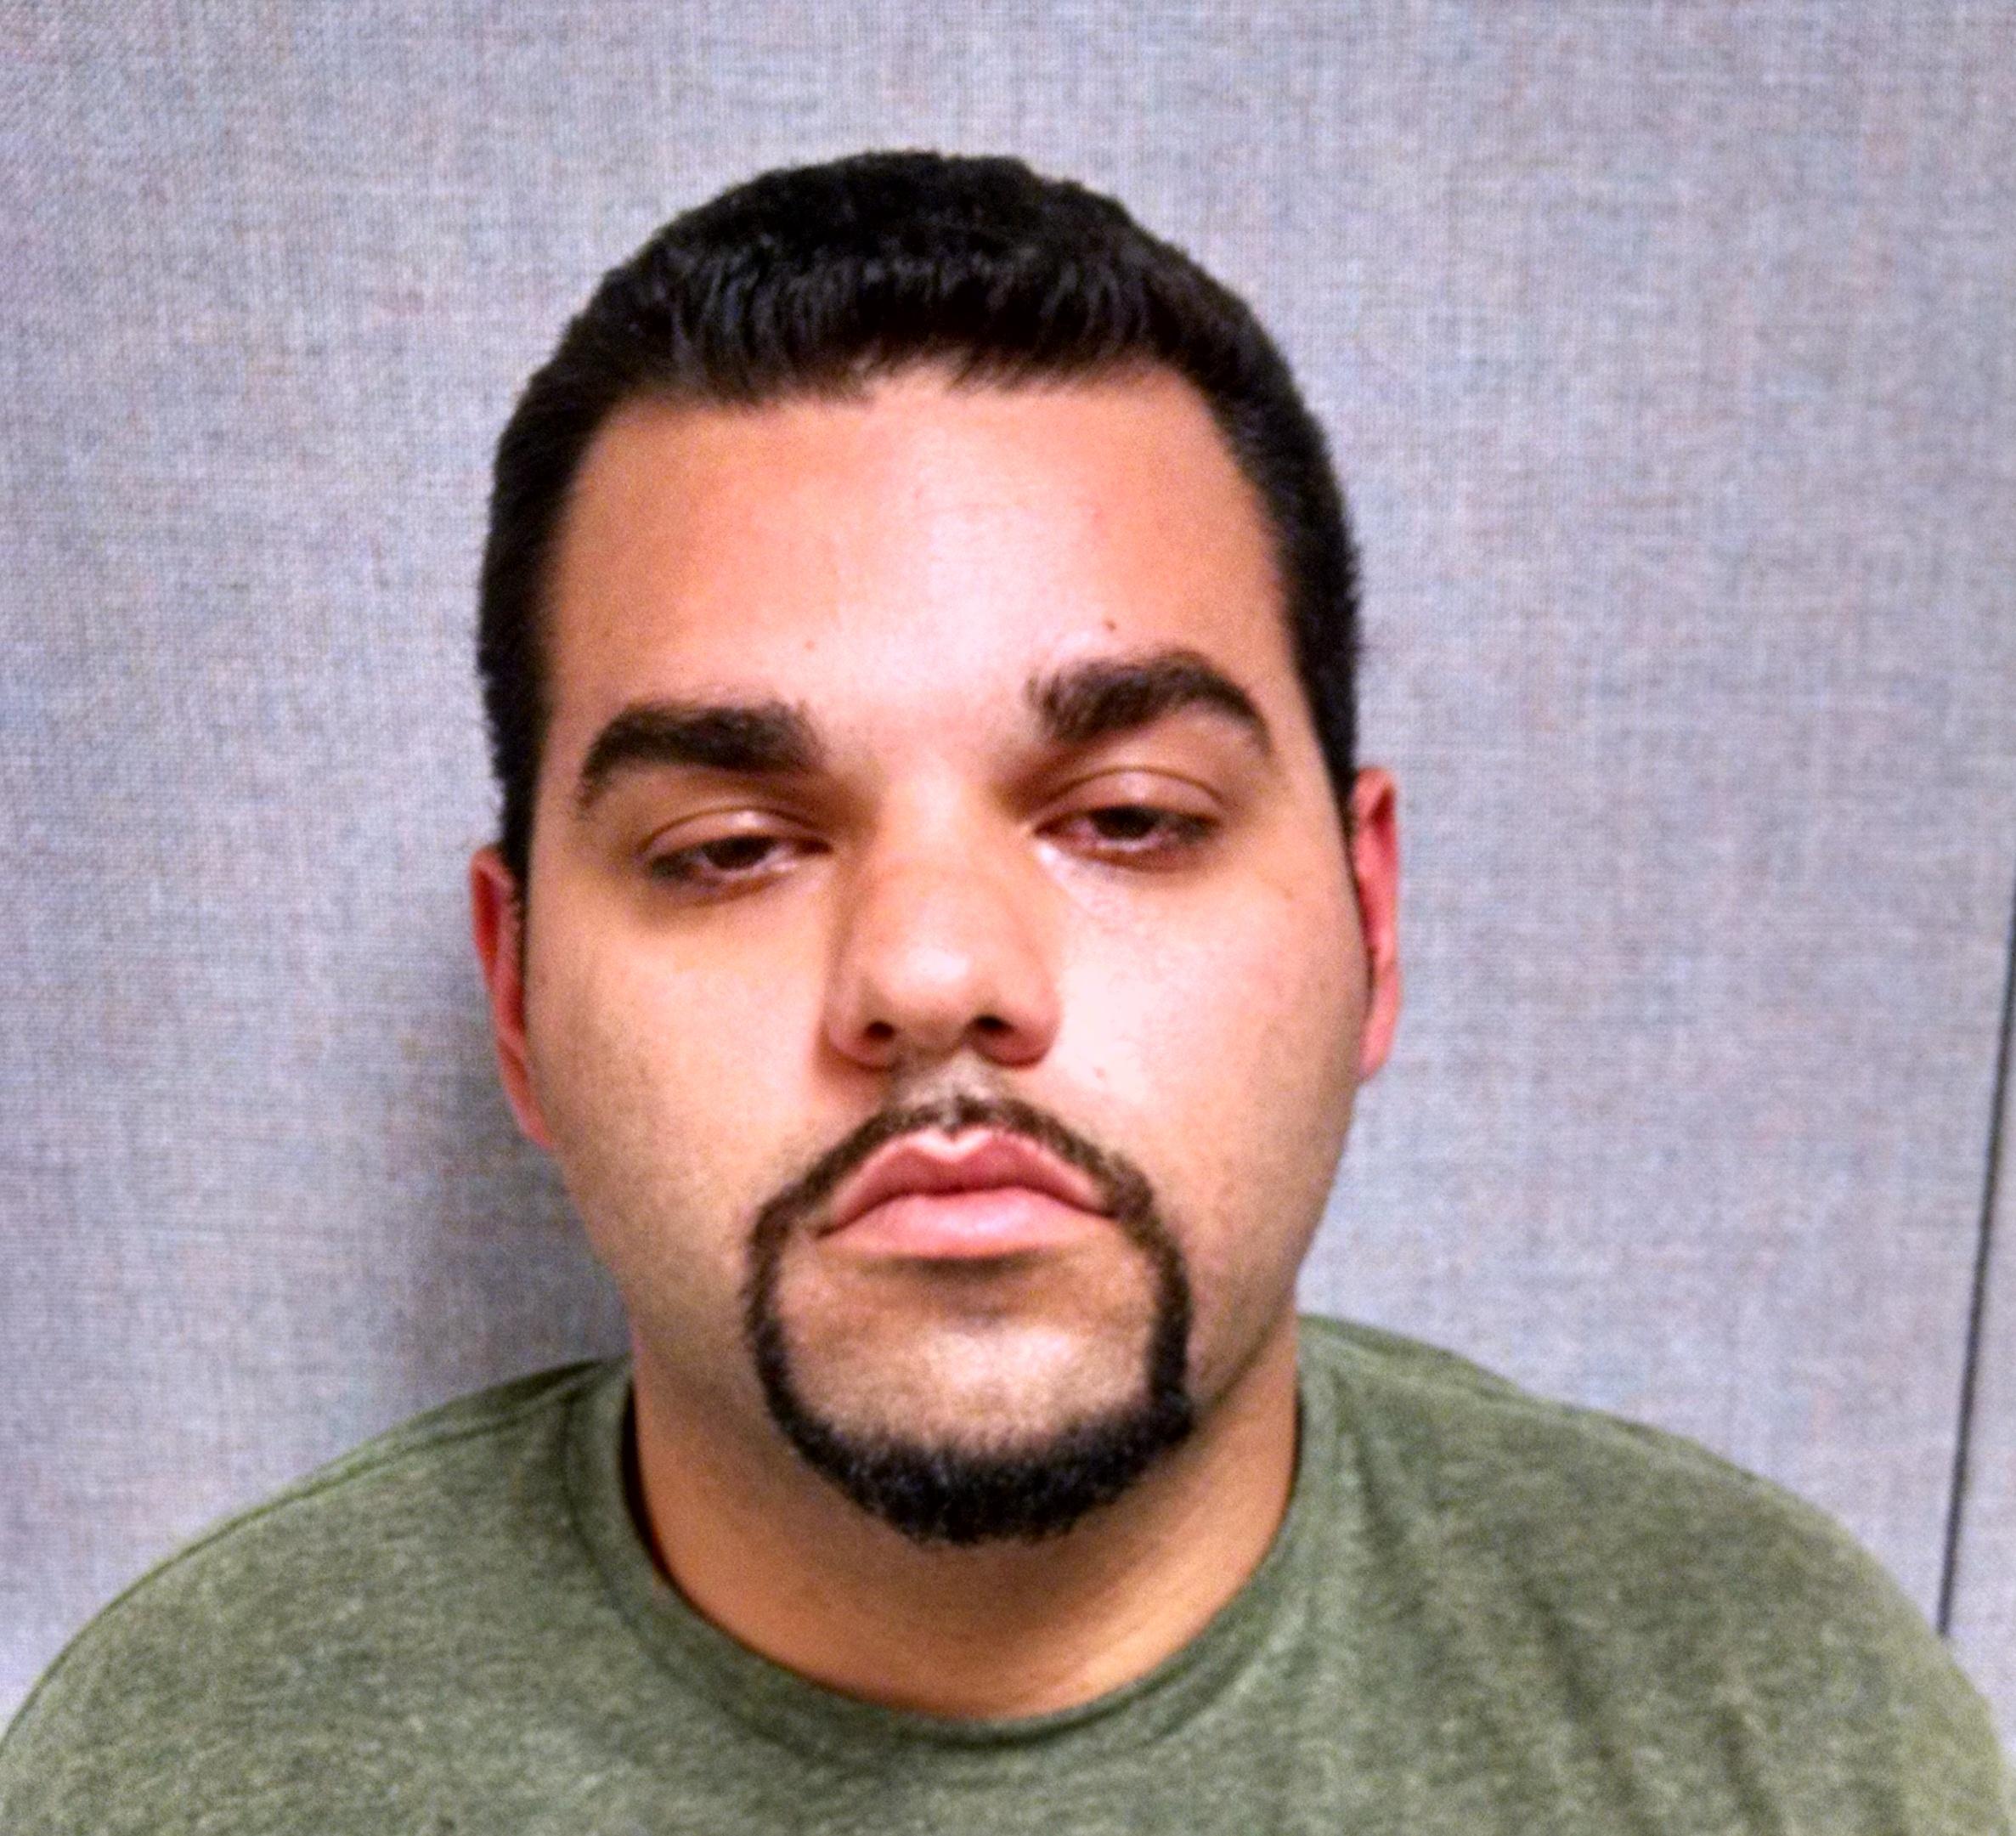 Silver Spring man arrested for impersonating police officer